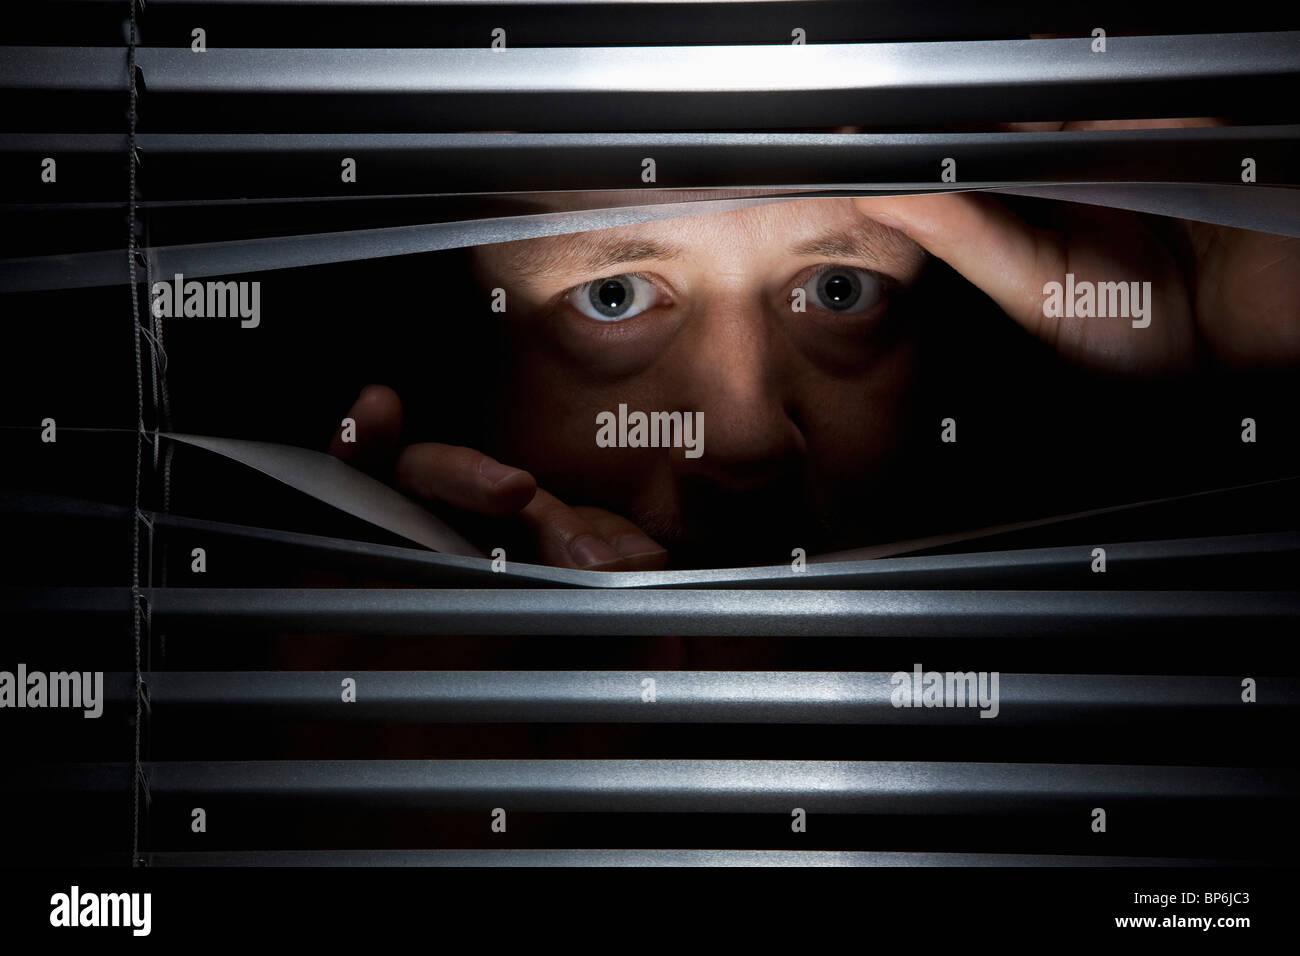 A man peeking through blinds - Stock Image